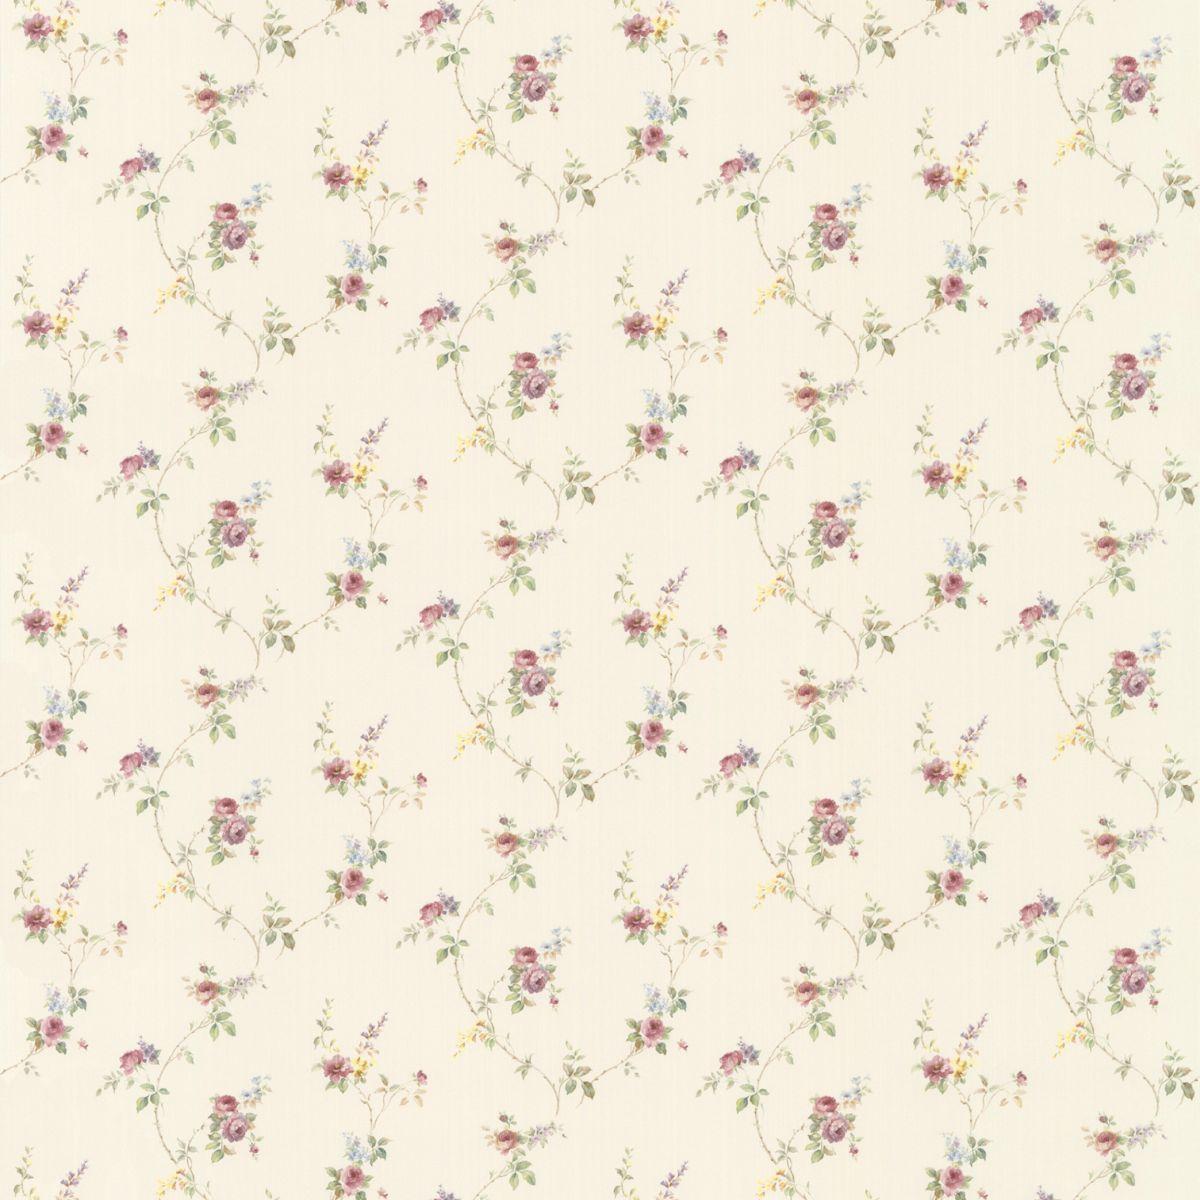 hochwertige tapeten und stoffe landhaus tapete floral prints pr33809 decowunder. Black Bedroom Furniture Sets. Home Design Ideas